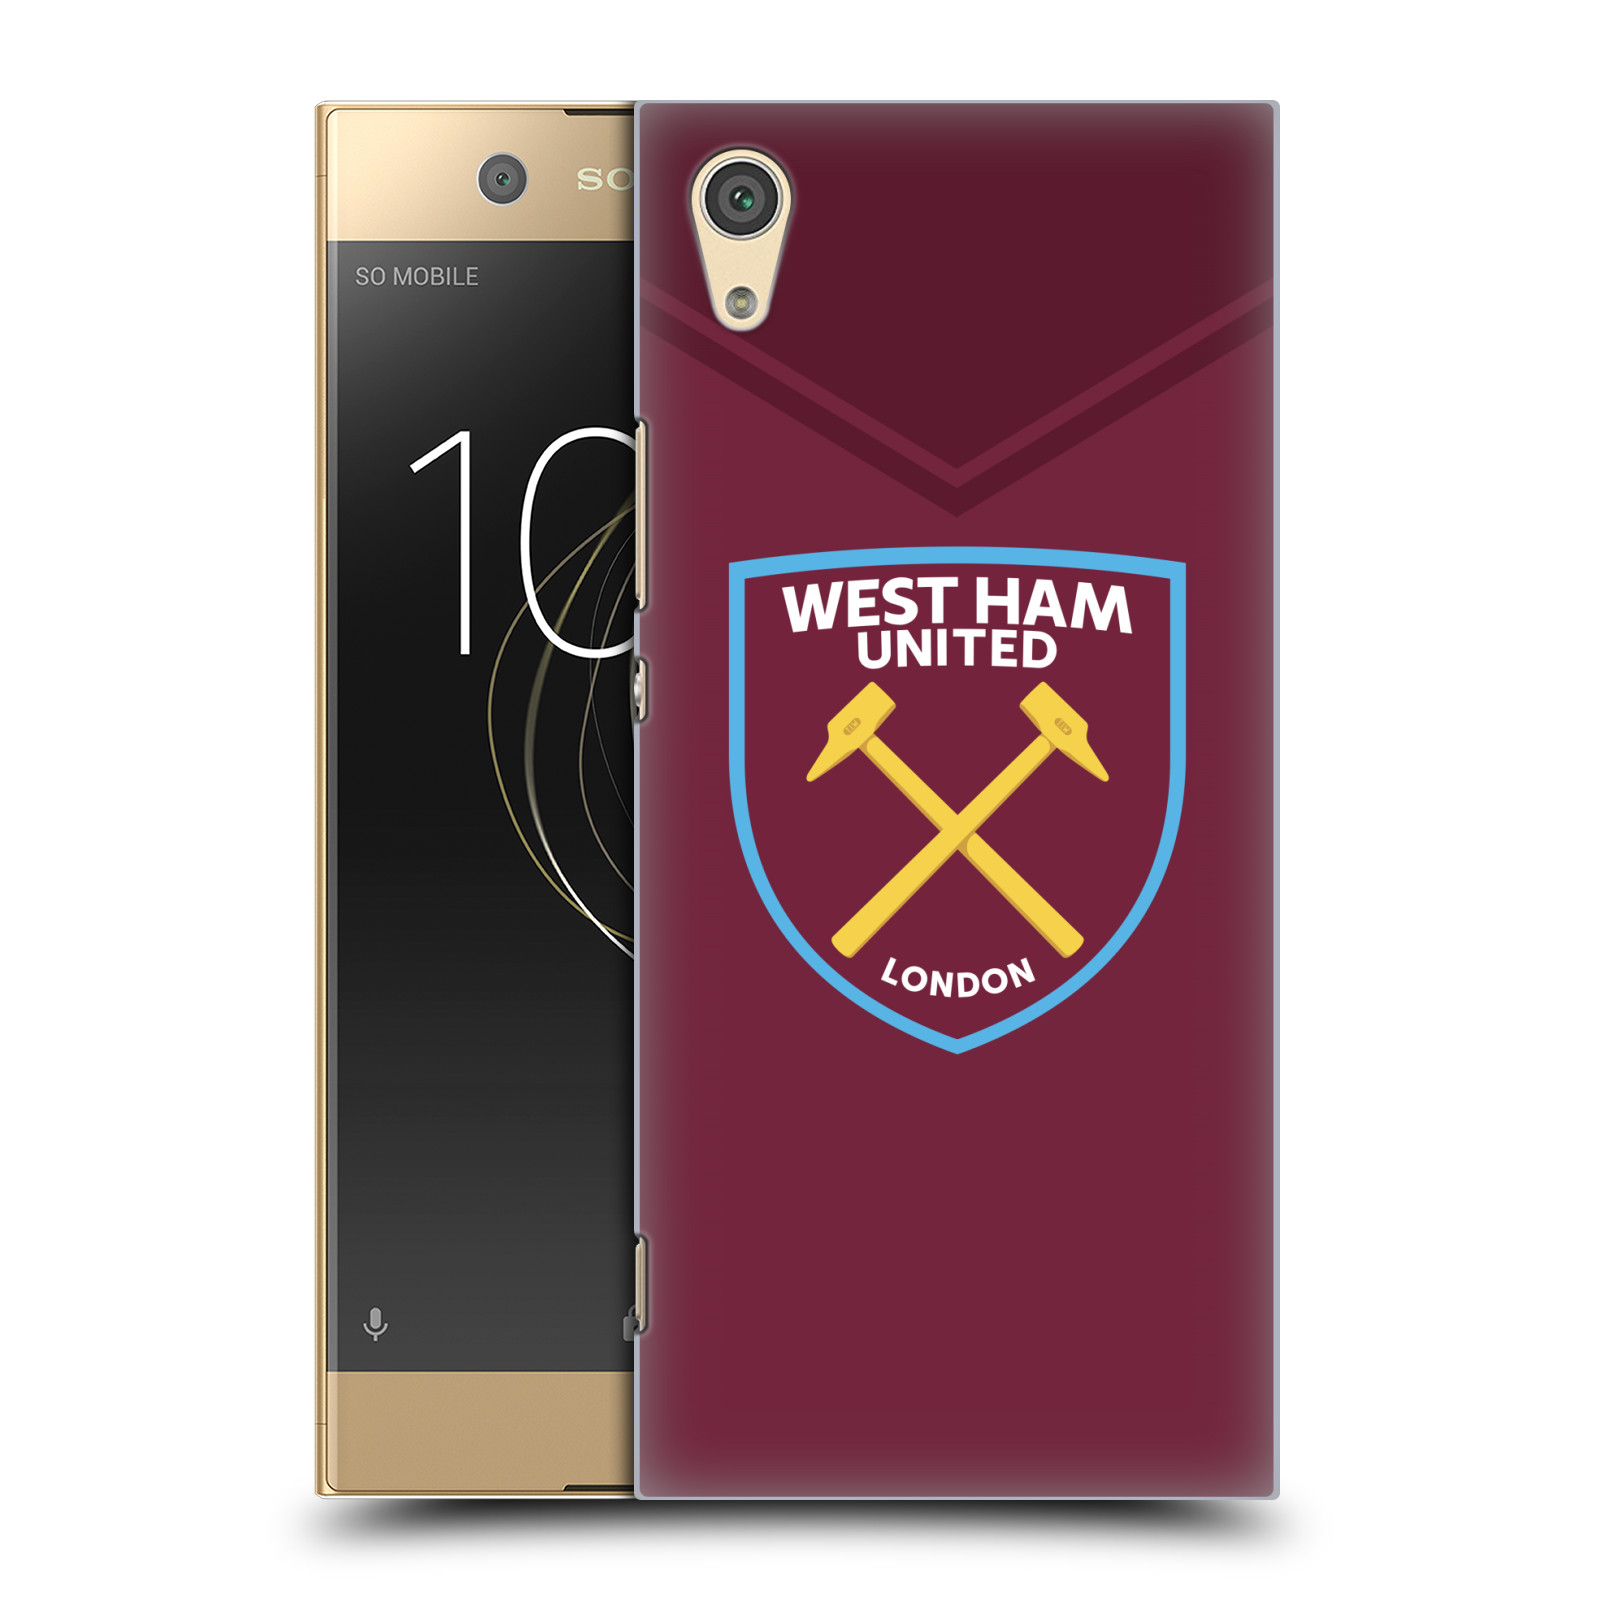 Plastové pouzdro na mobil Sony Xperia XA1 - Head Case - West Ham United - Logo